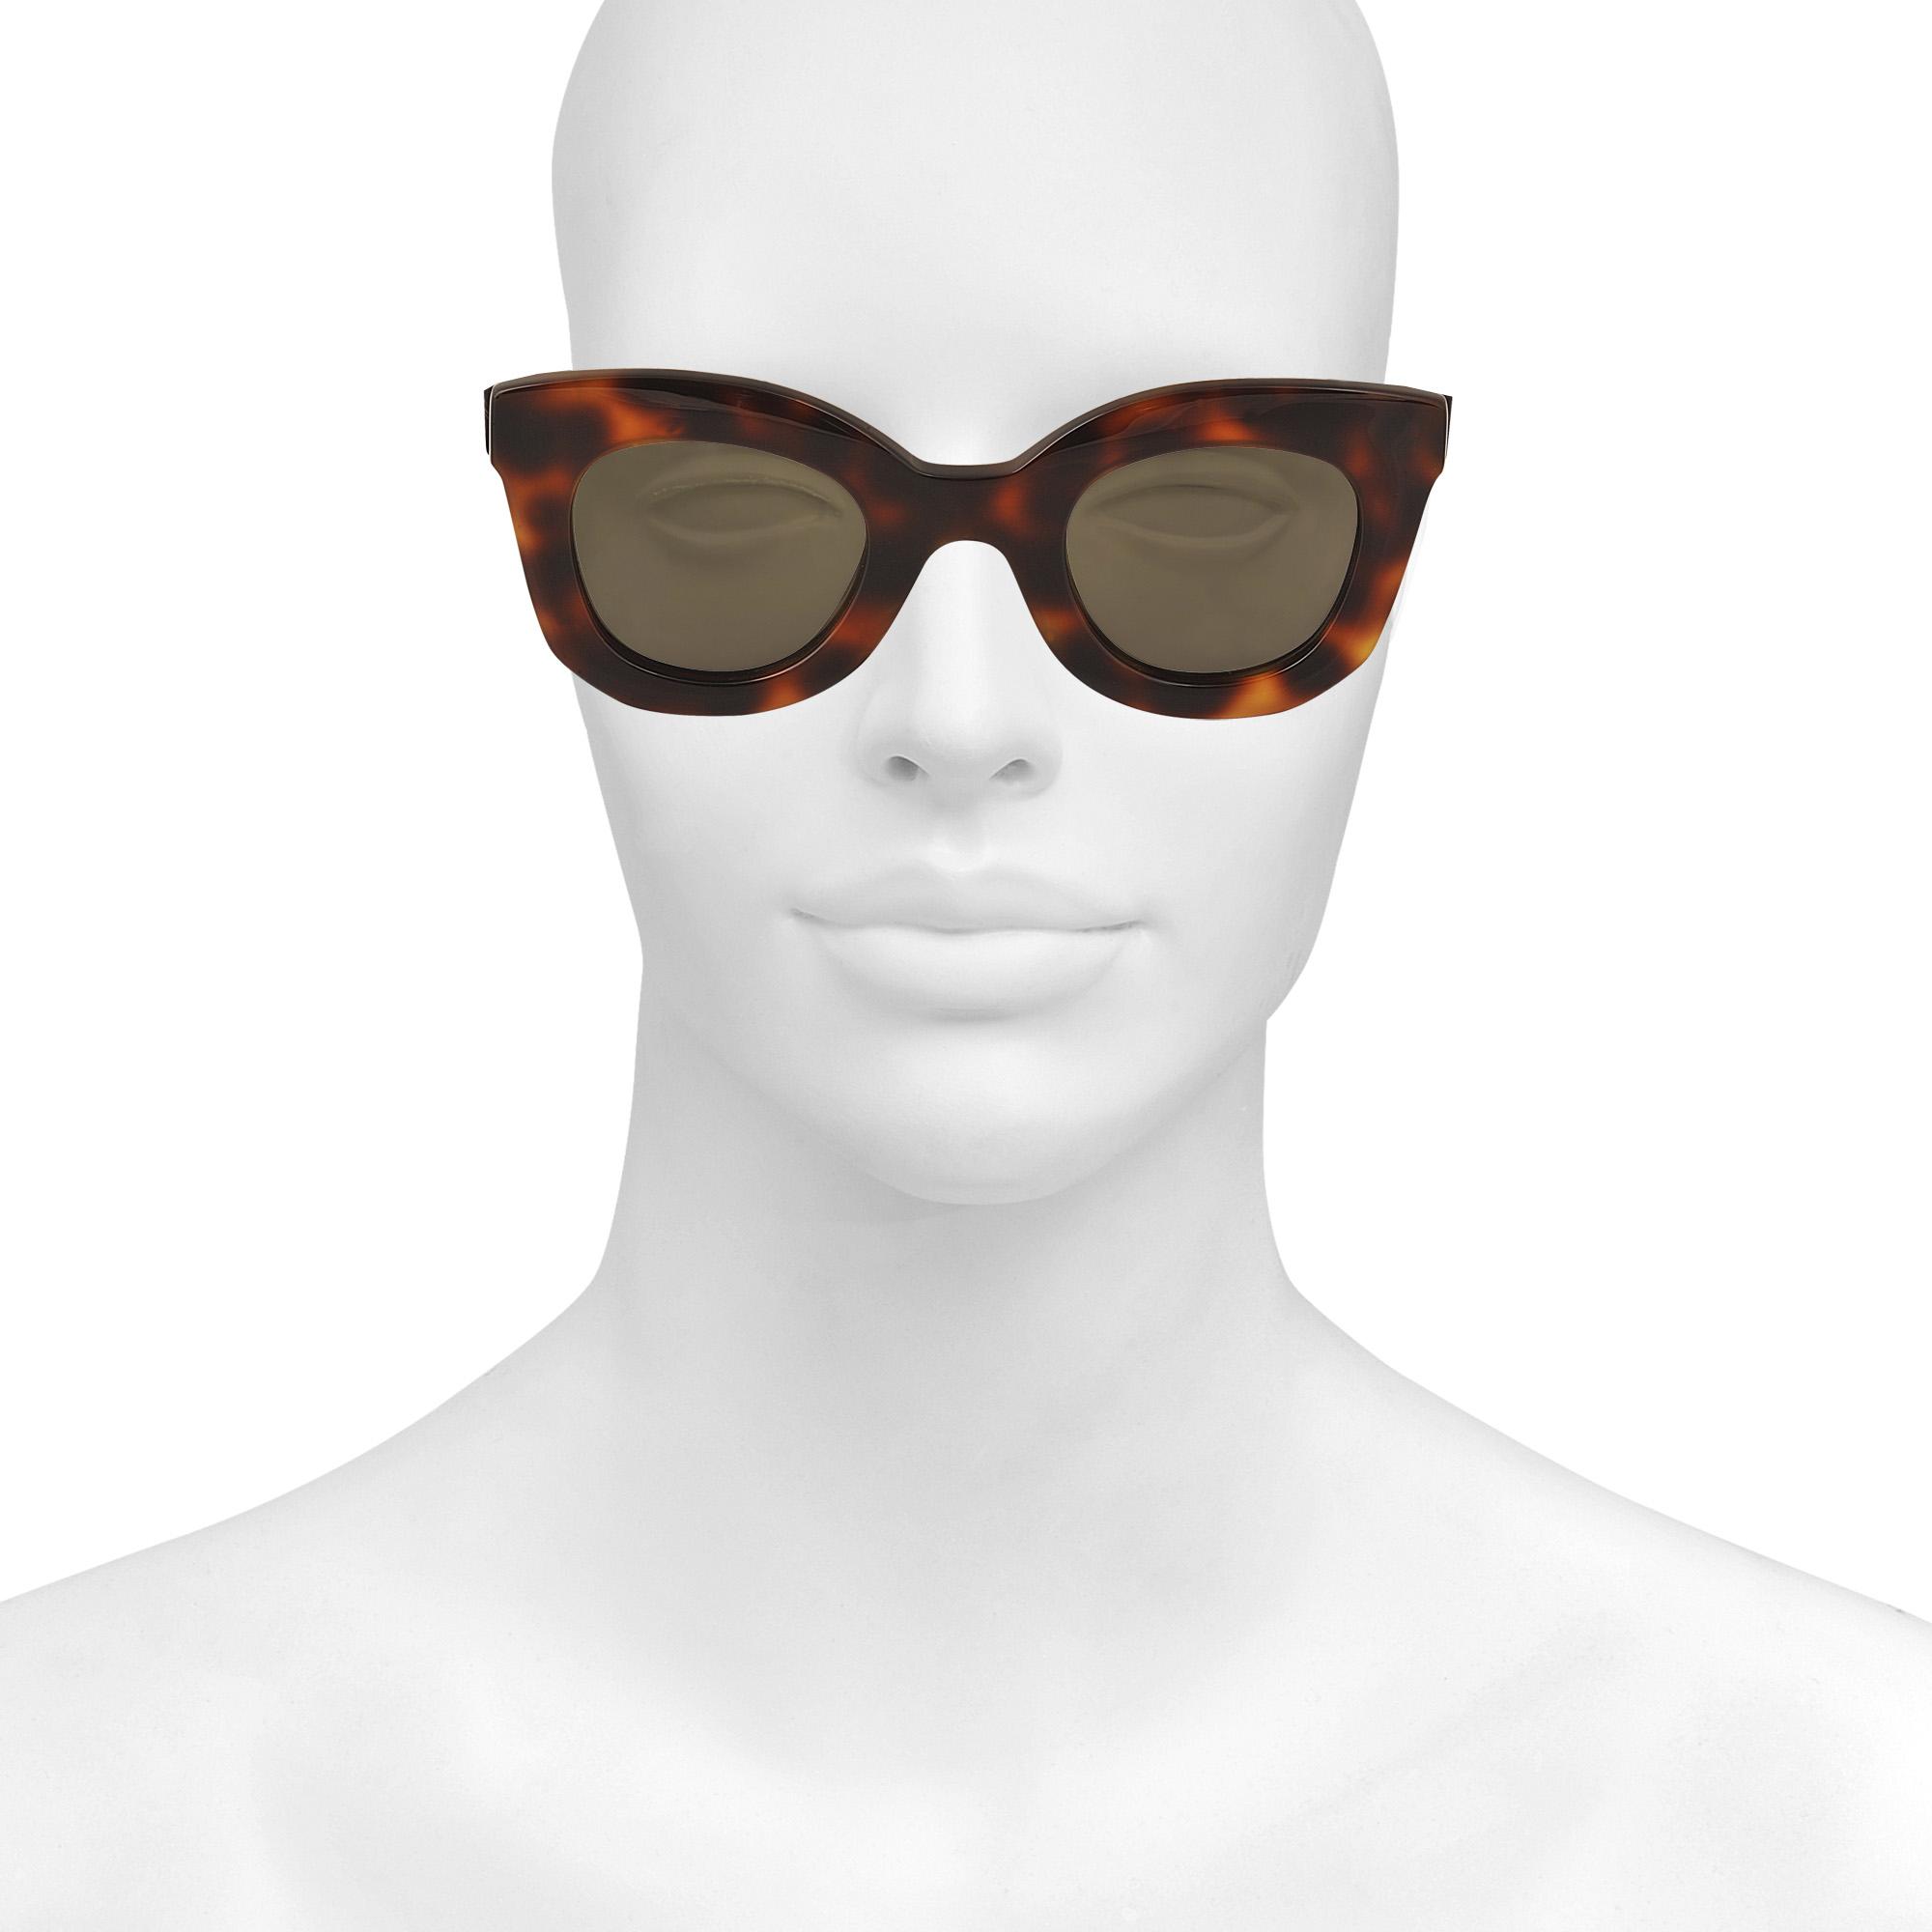 014029844ee Lyst - Céline Cl 41393 s Baby Marta Sunglasses in Brown